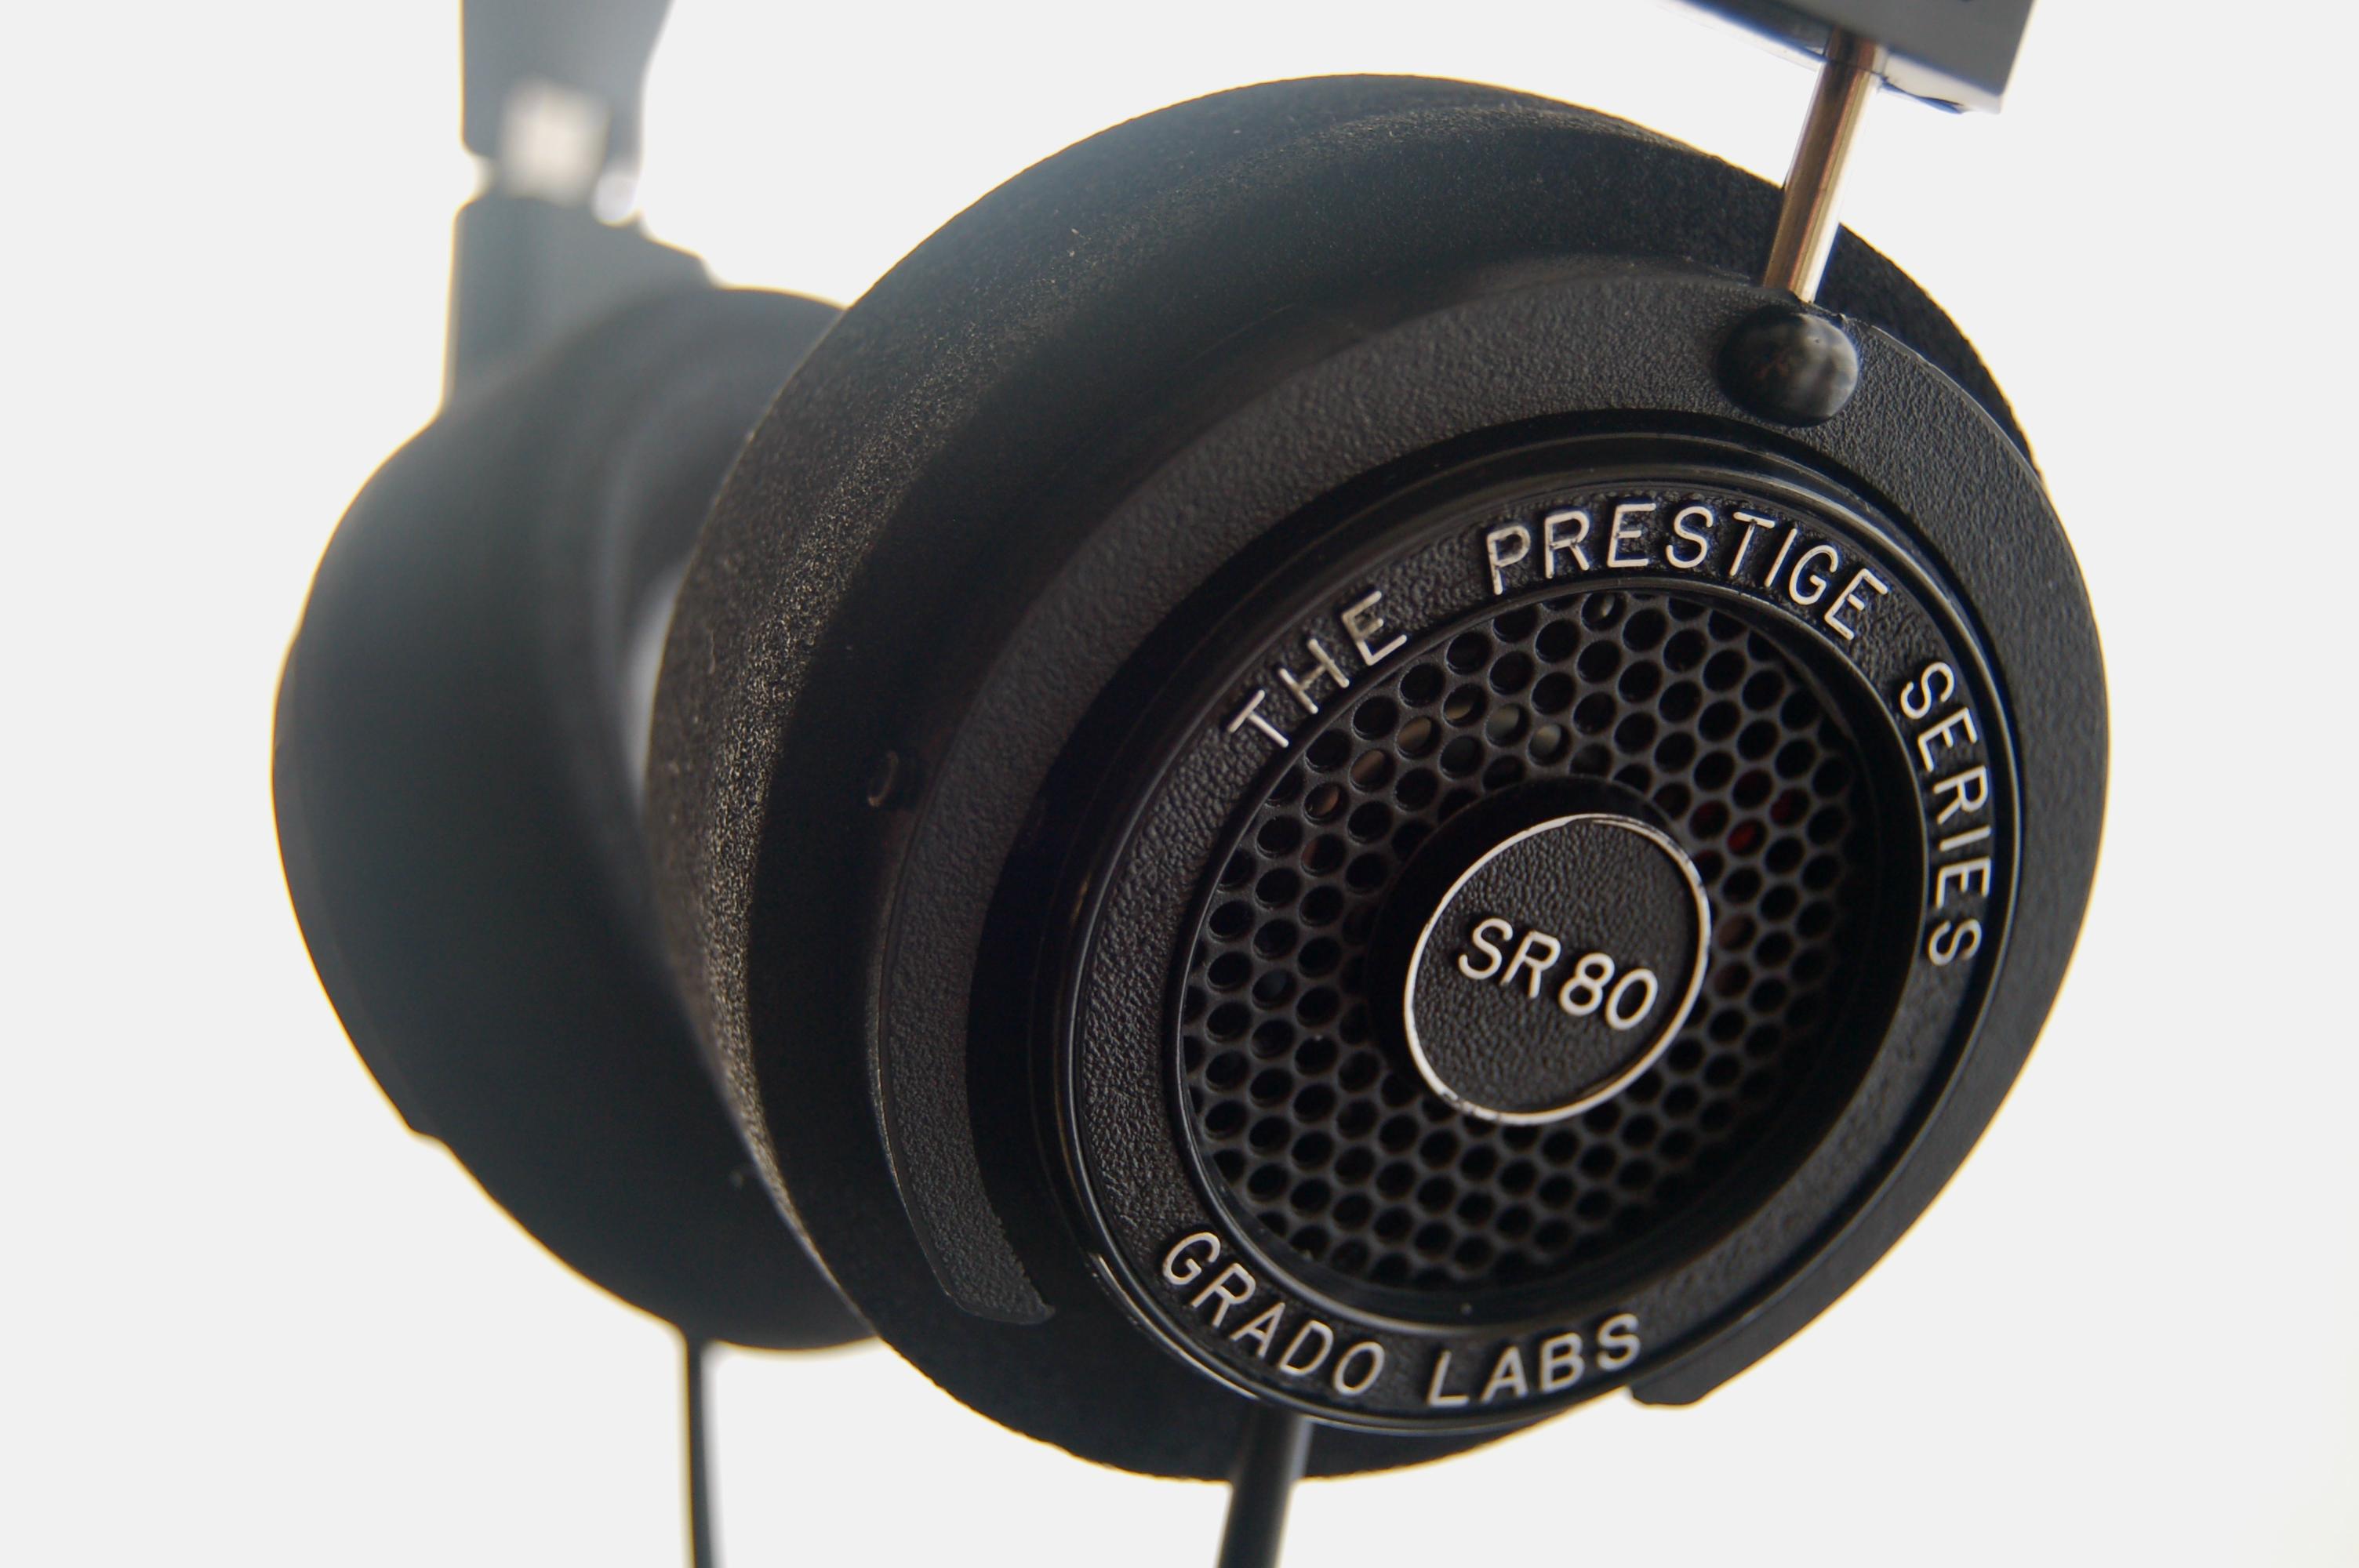 grado professional closed headphone